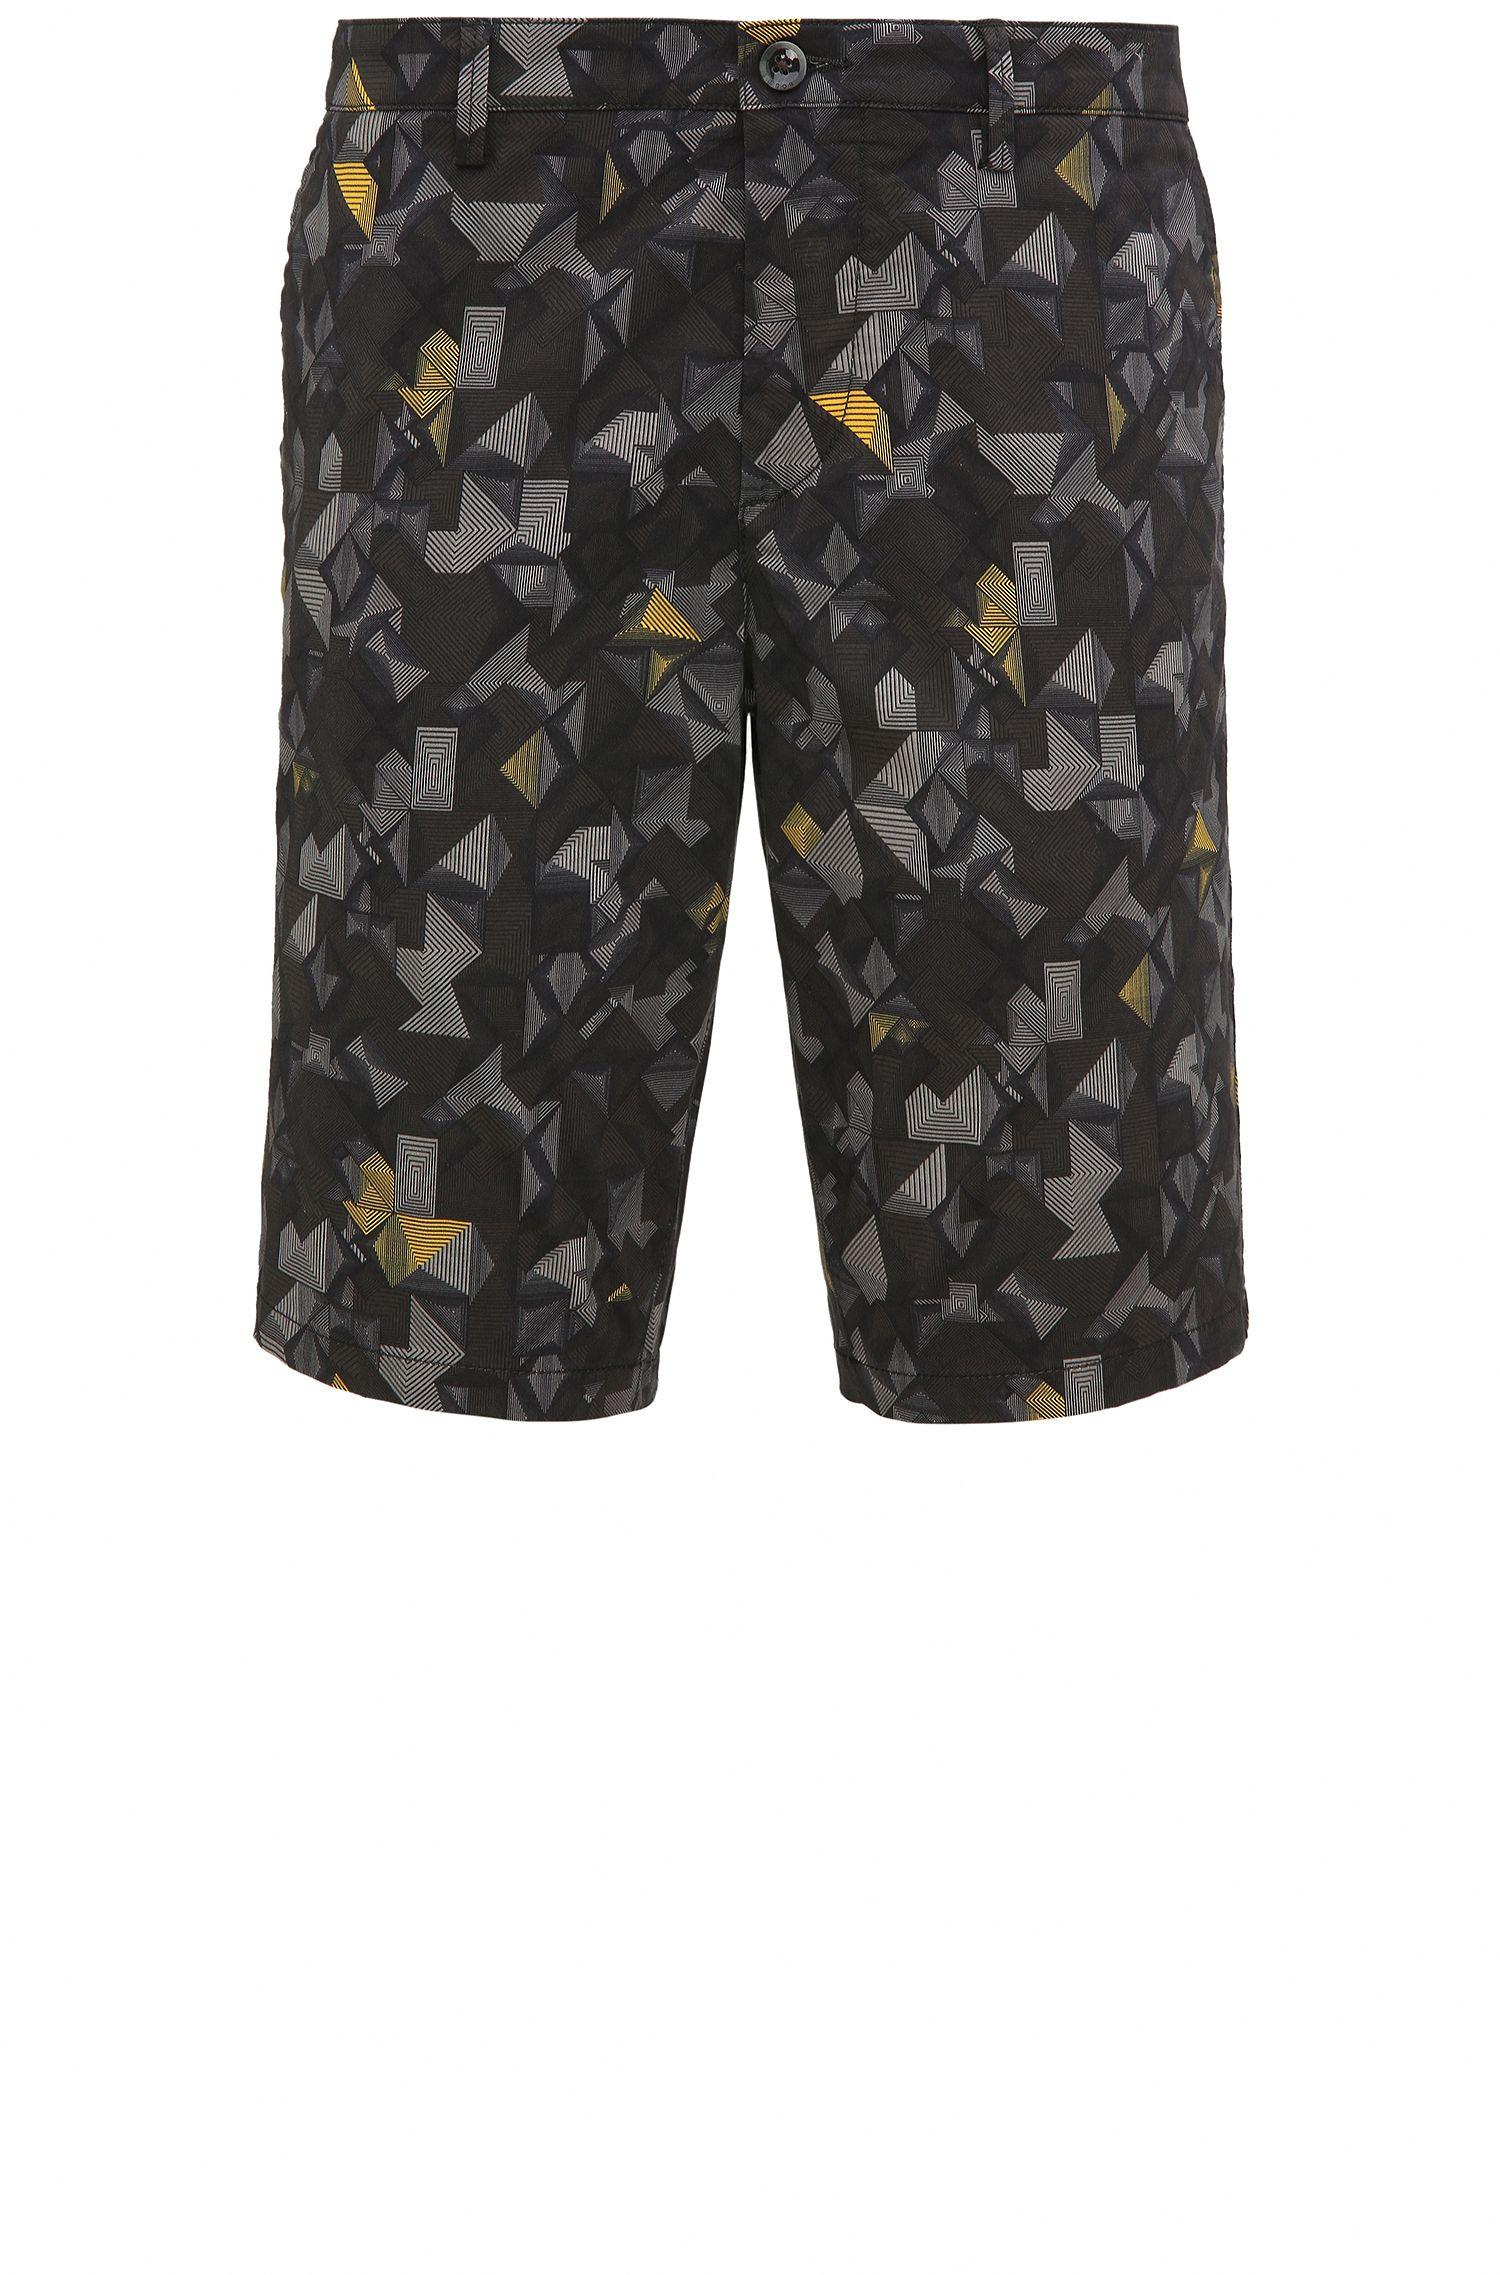 'Liem Print W' | Slim Fit, Printed Sateen Stretch Cotton Shorts